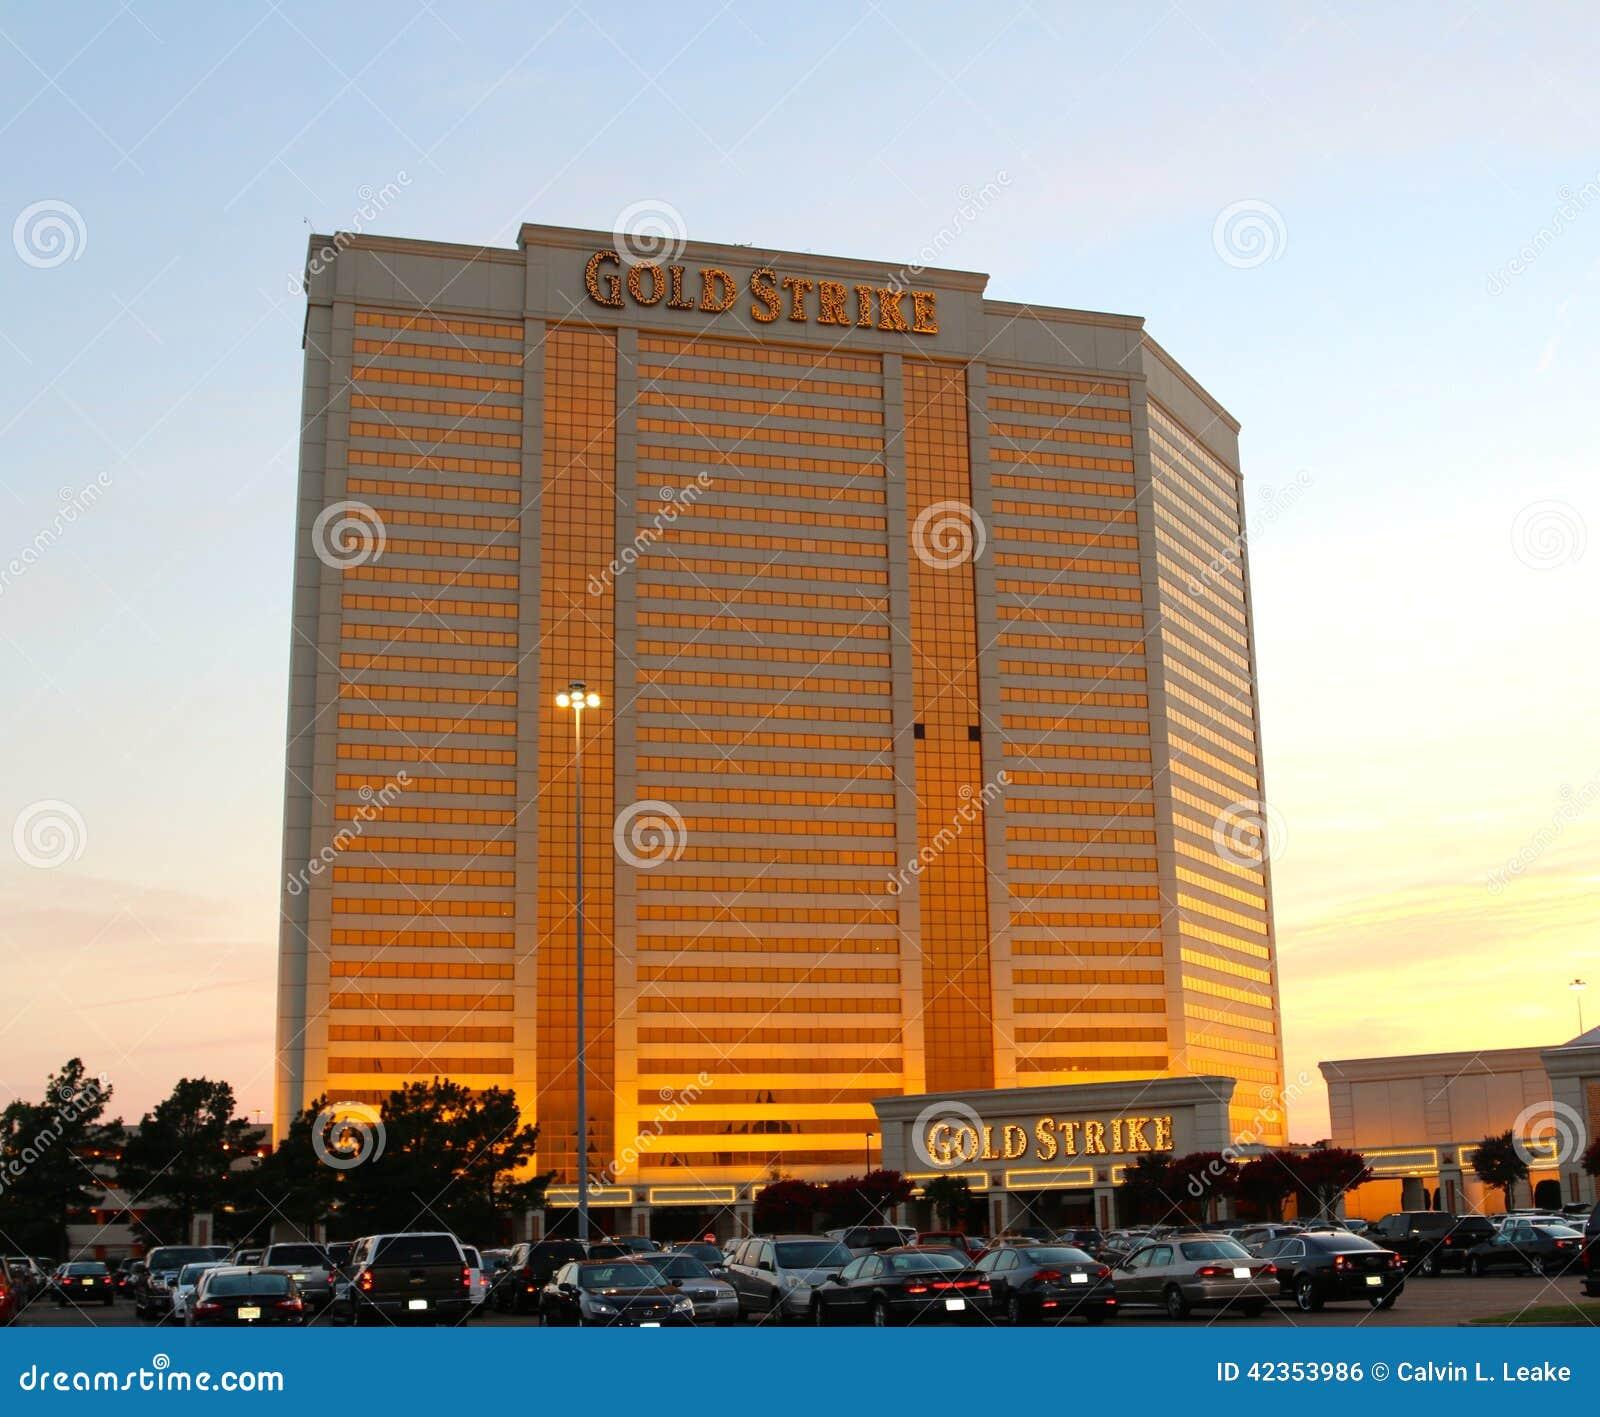 Gold strike casino tunica mississippi 12